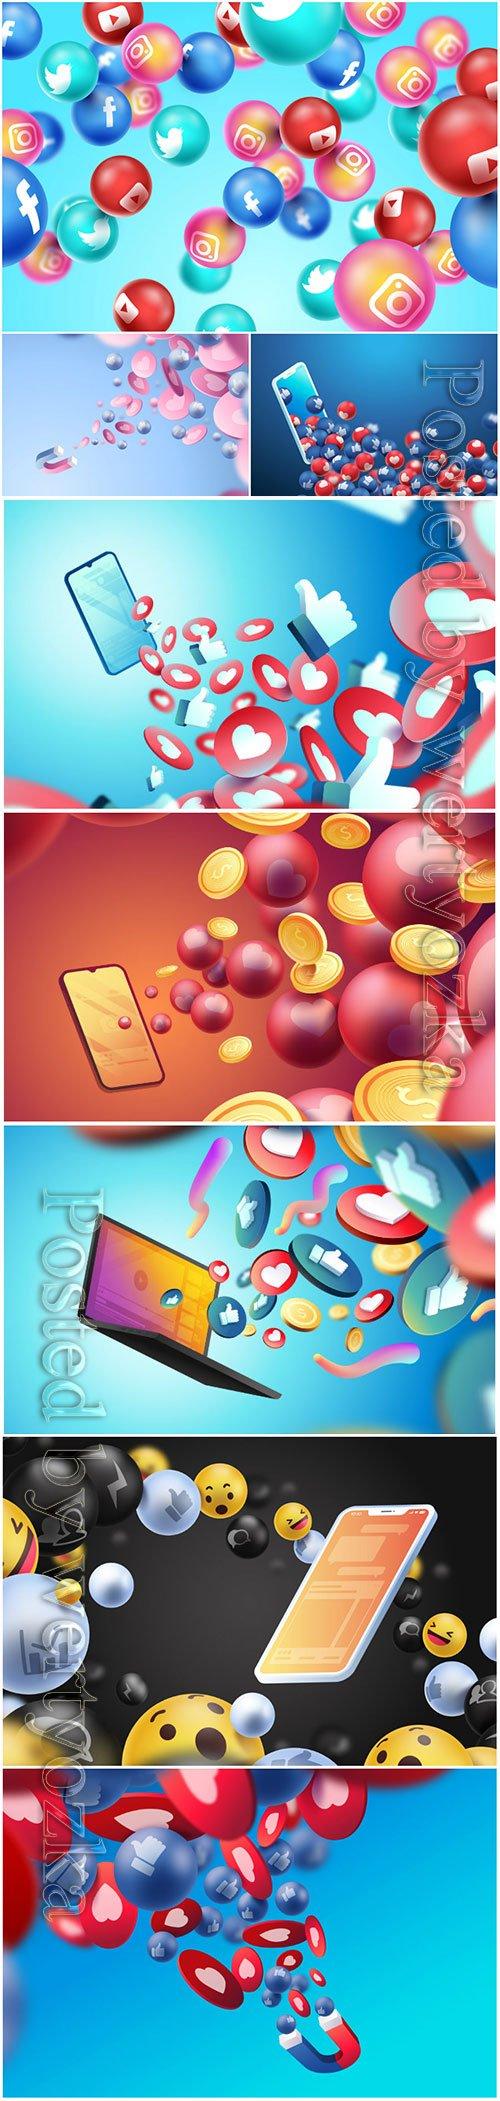 Social media 3d vector background